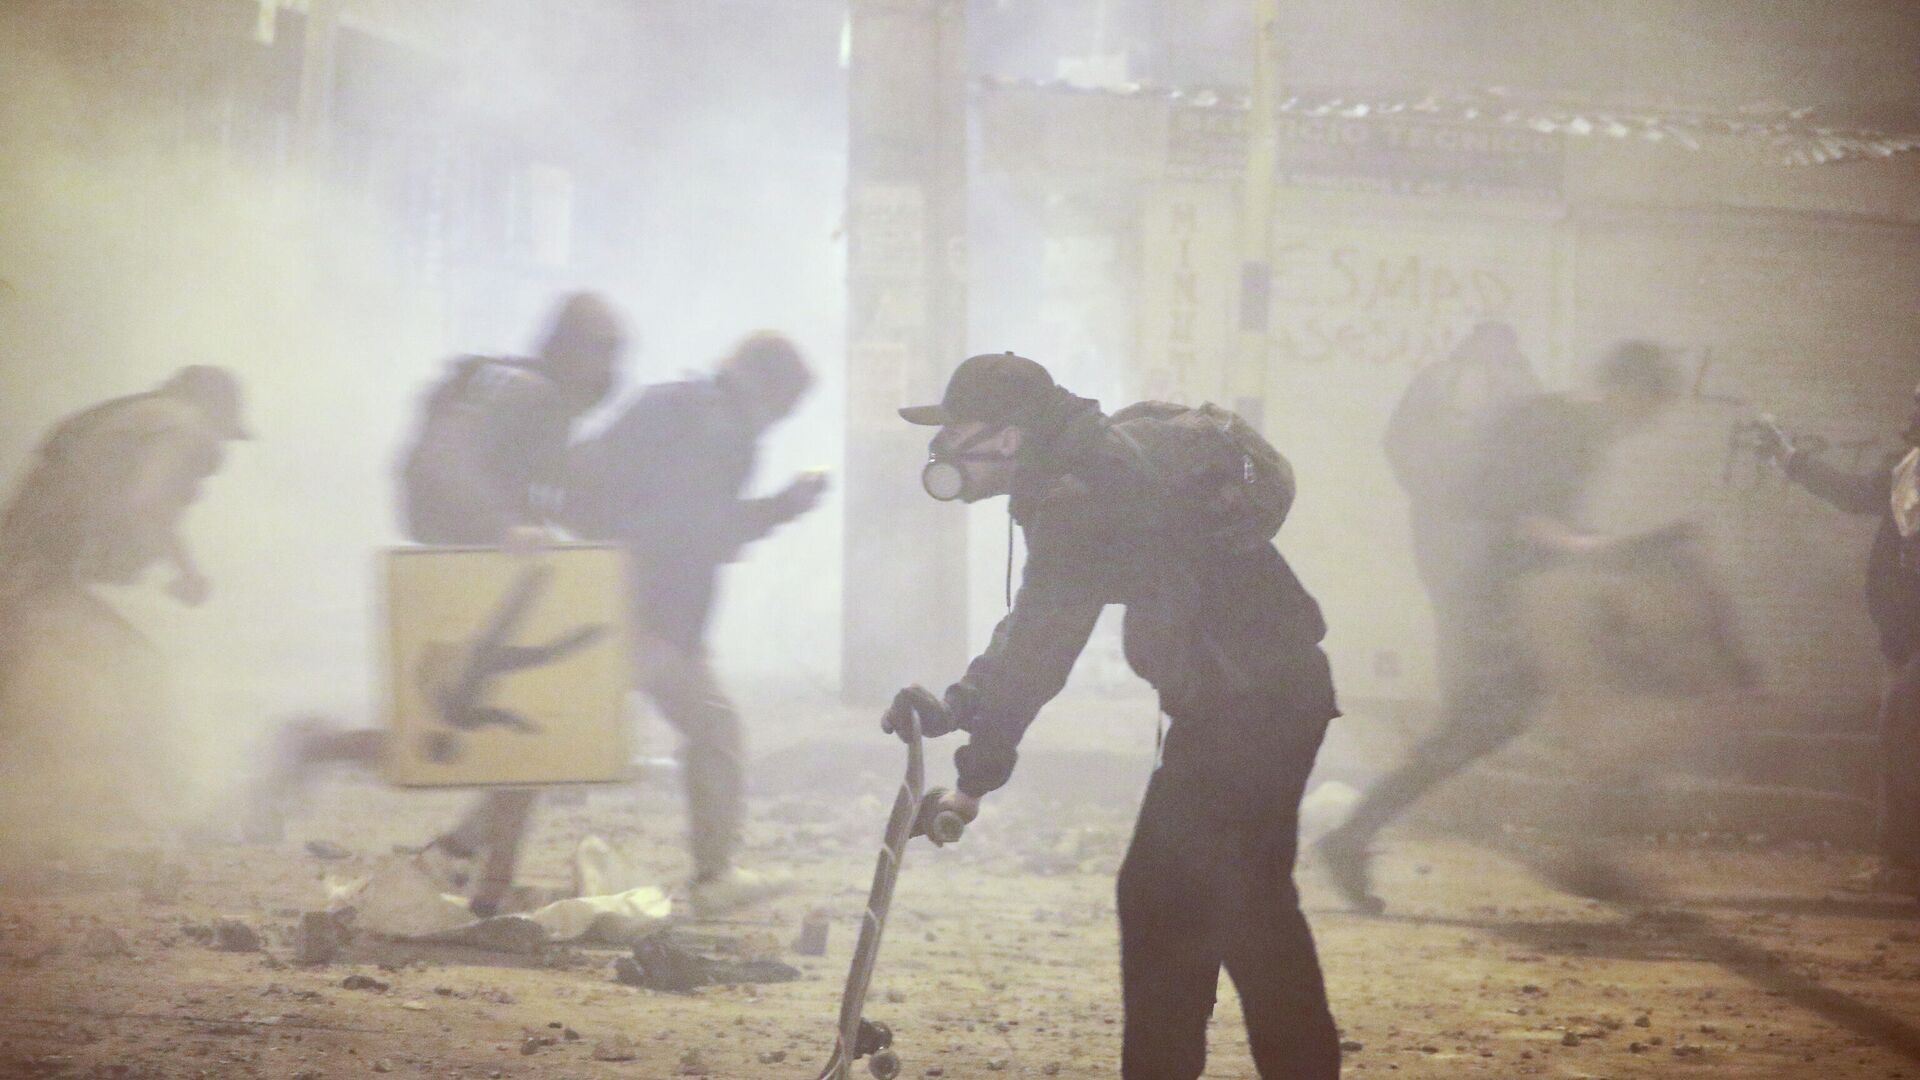 Protestas en Colombia - Sputnik Mundo, 1920, 29.06.2021